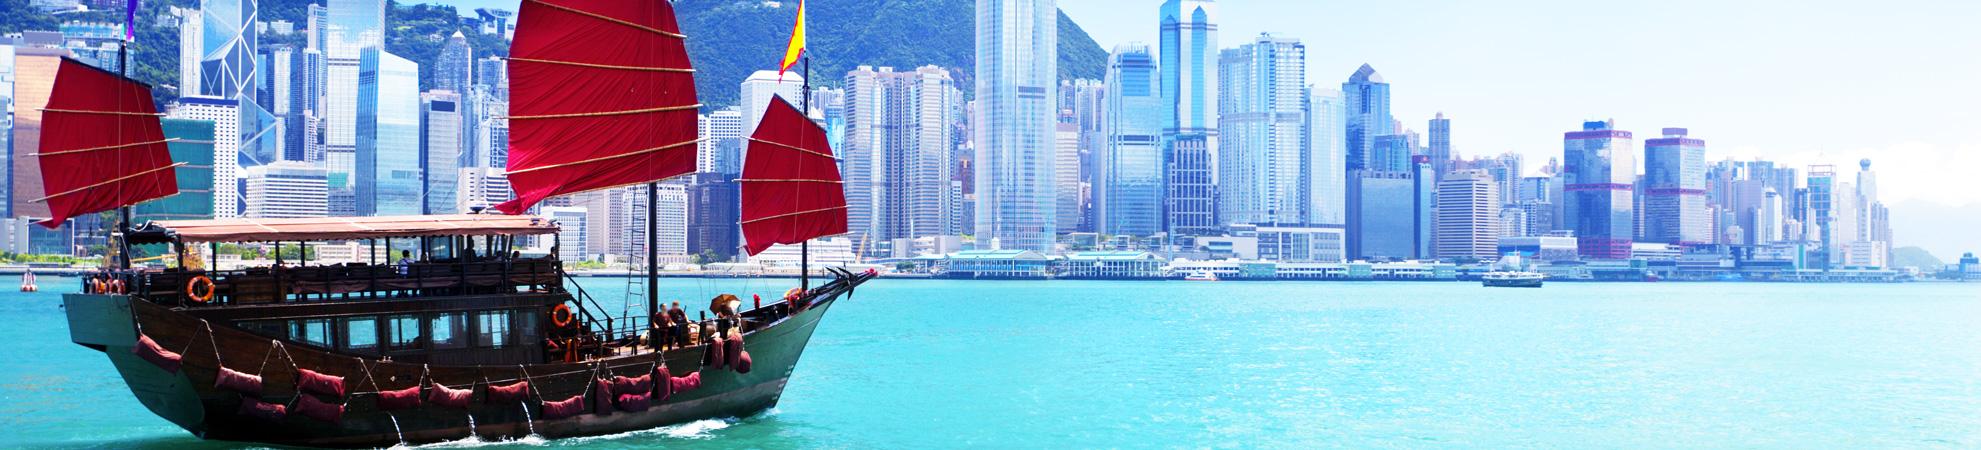 Aller en bateau en Chine